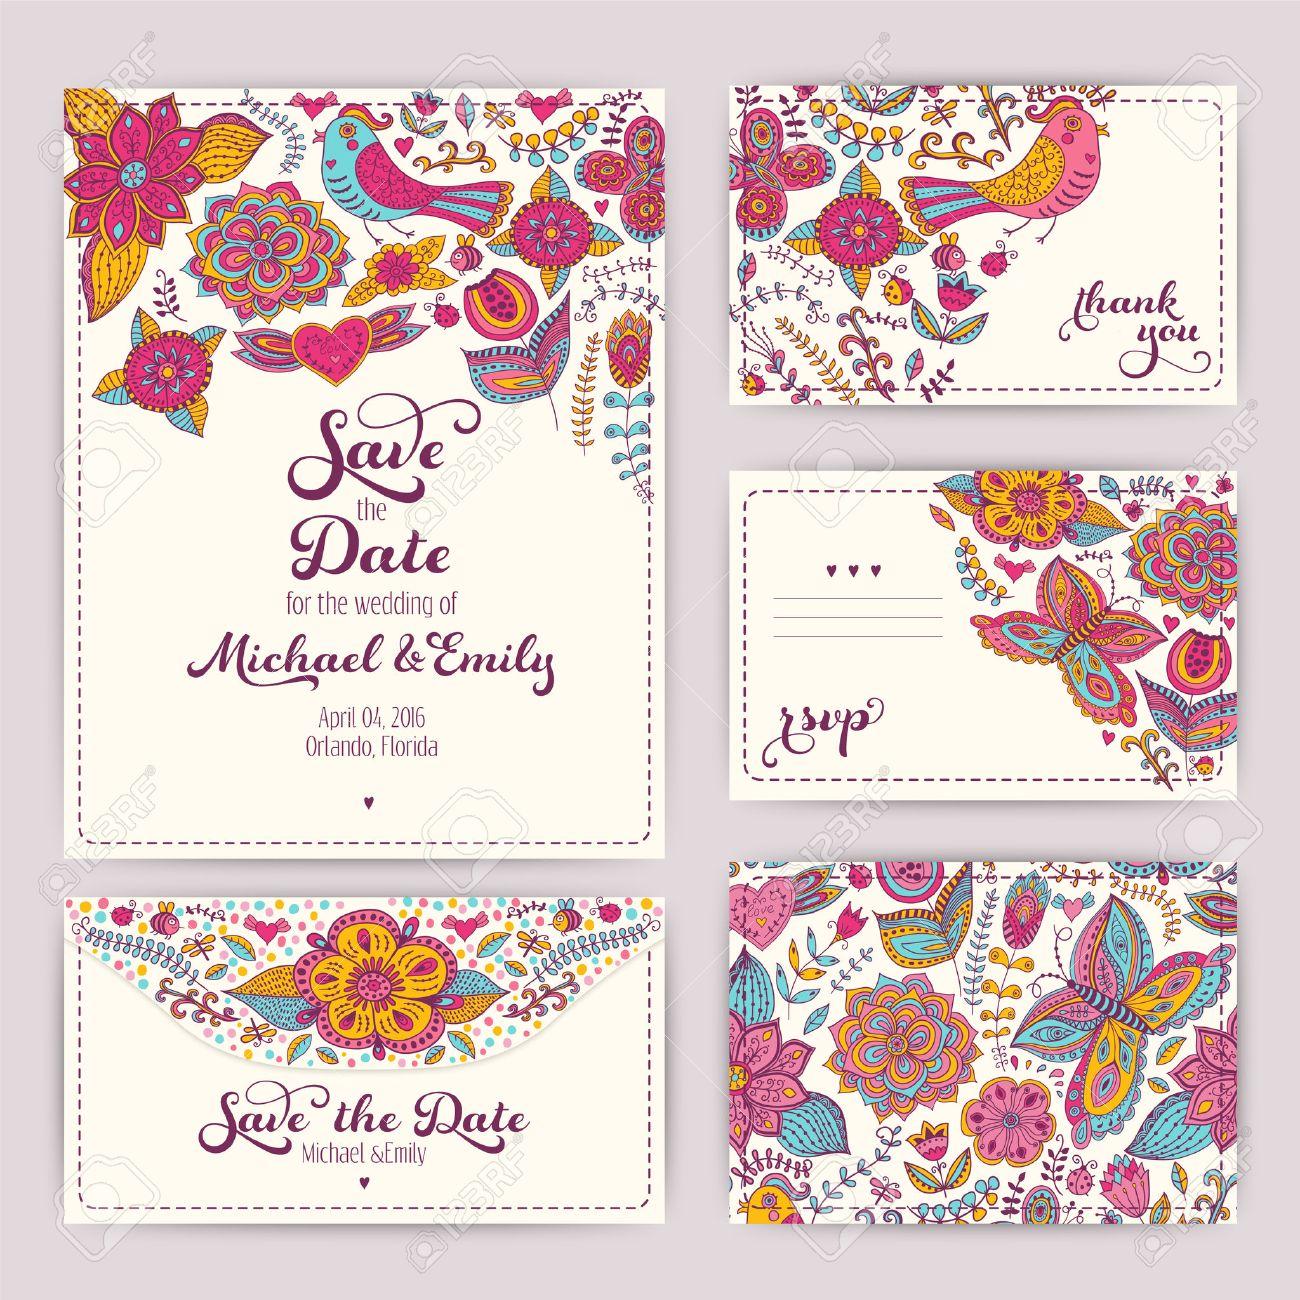 Printable Wedding Invitation Template: Invitation, Envelope ...